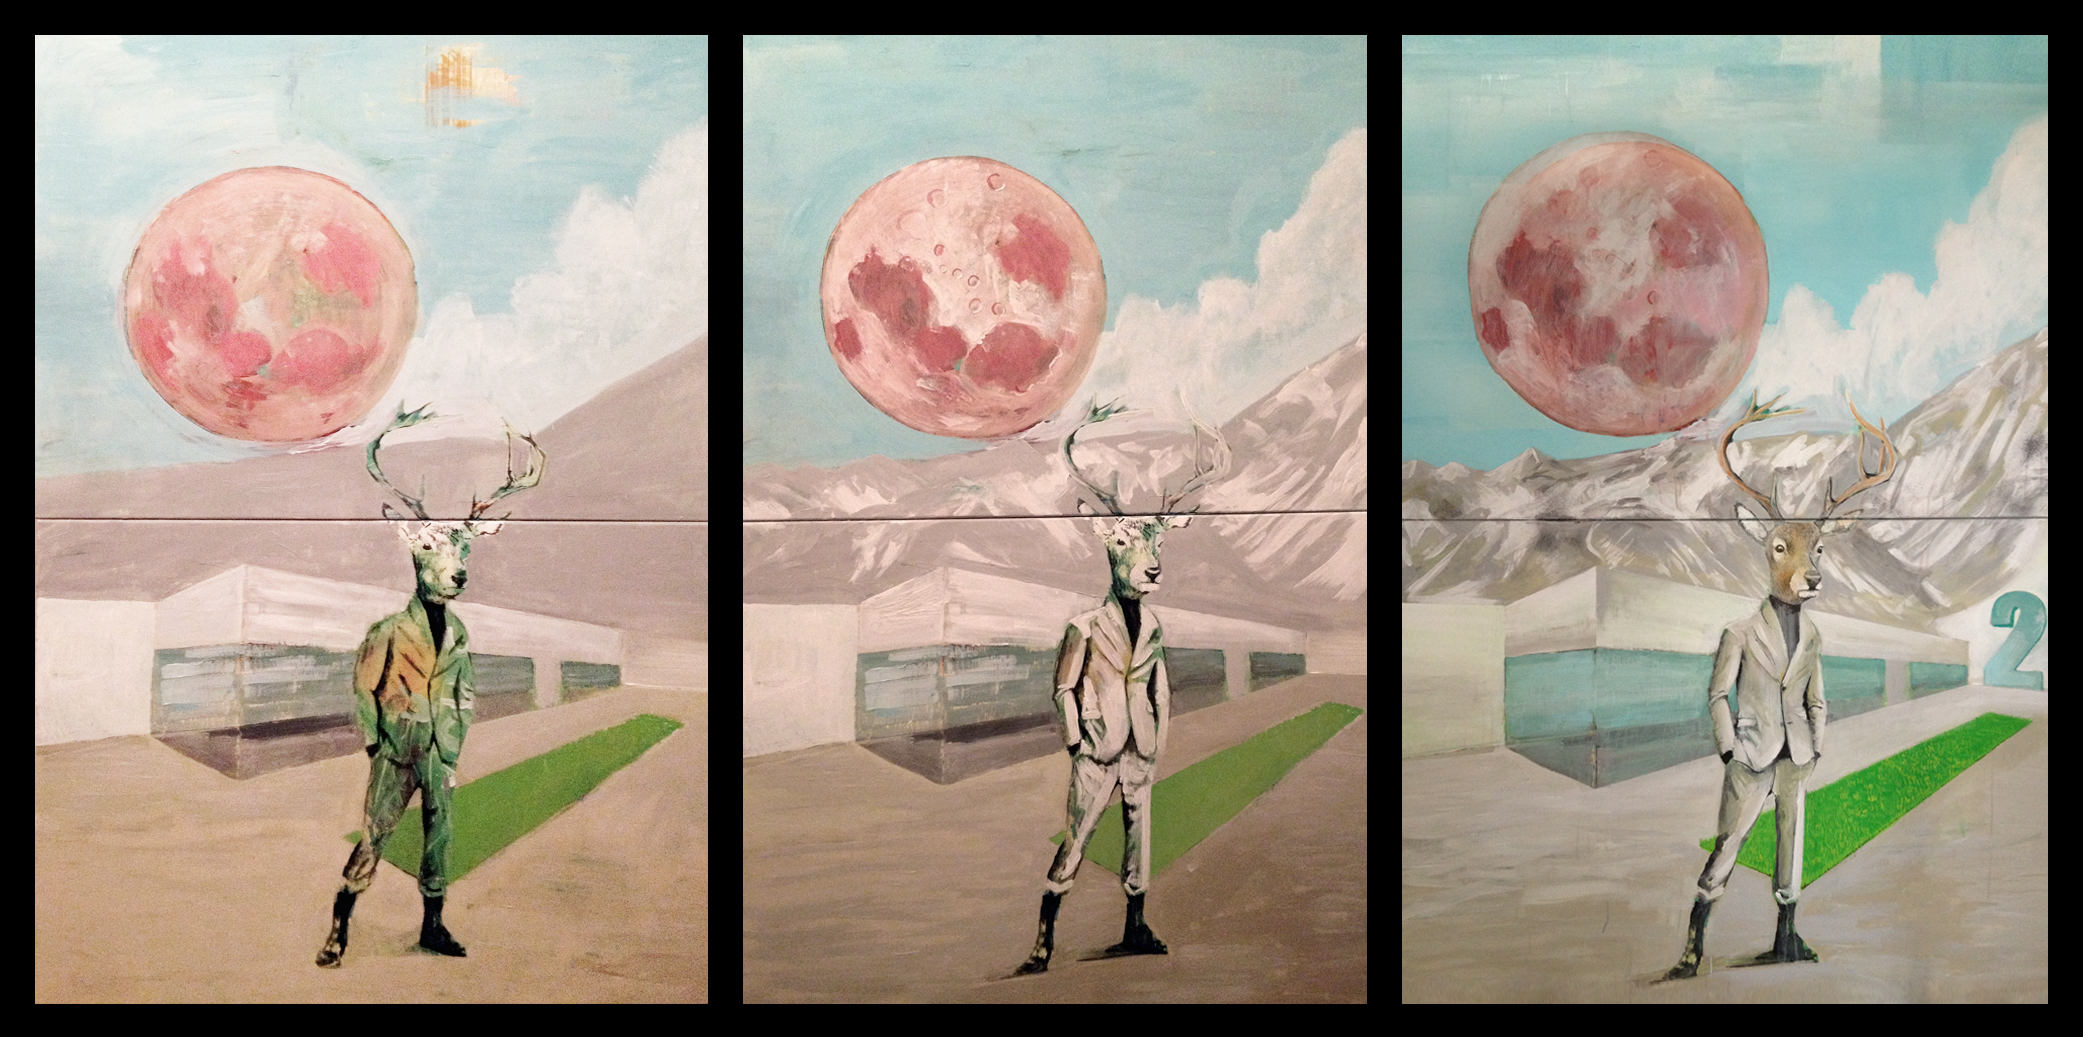 księżyc step